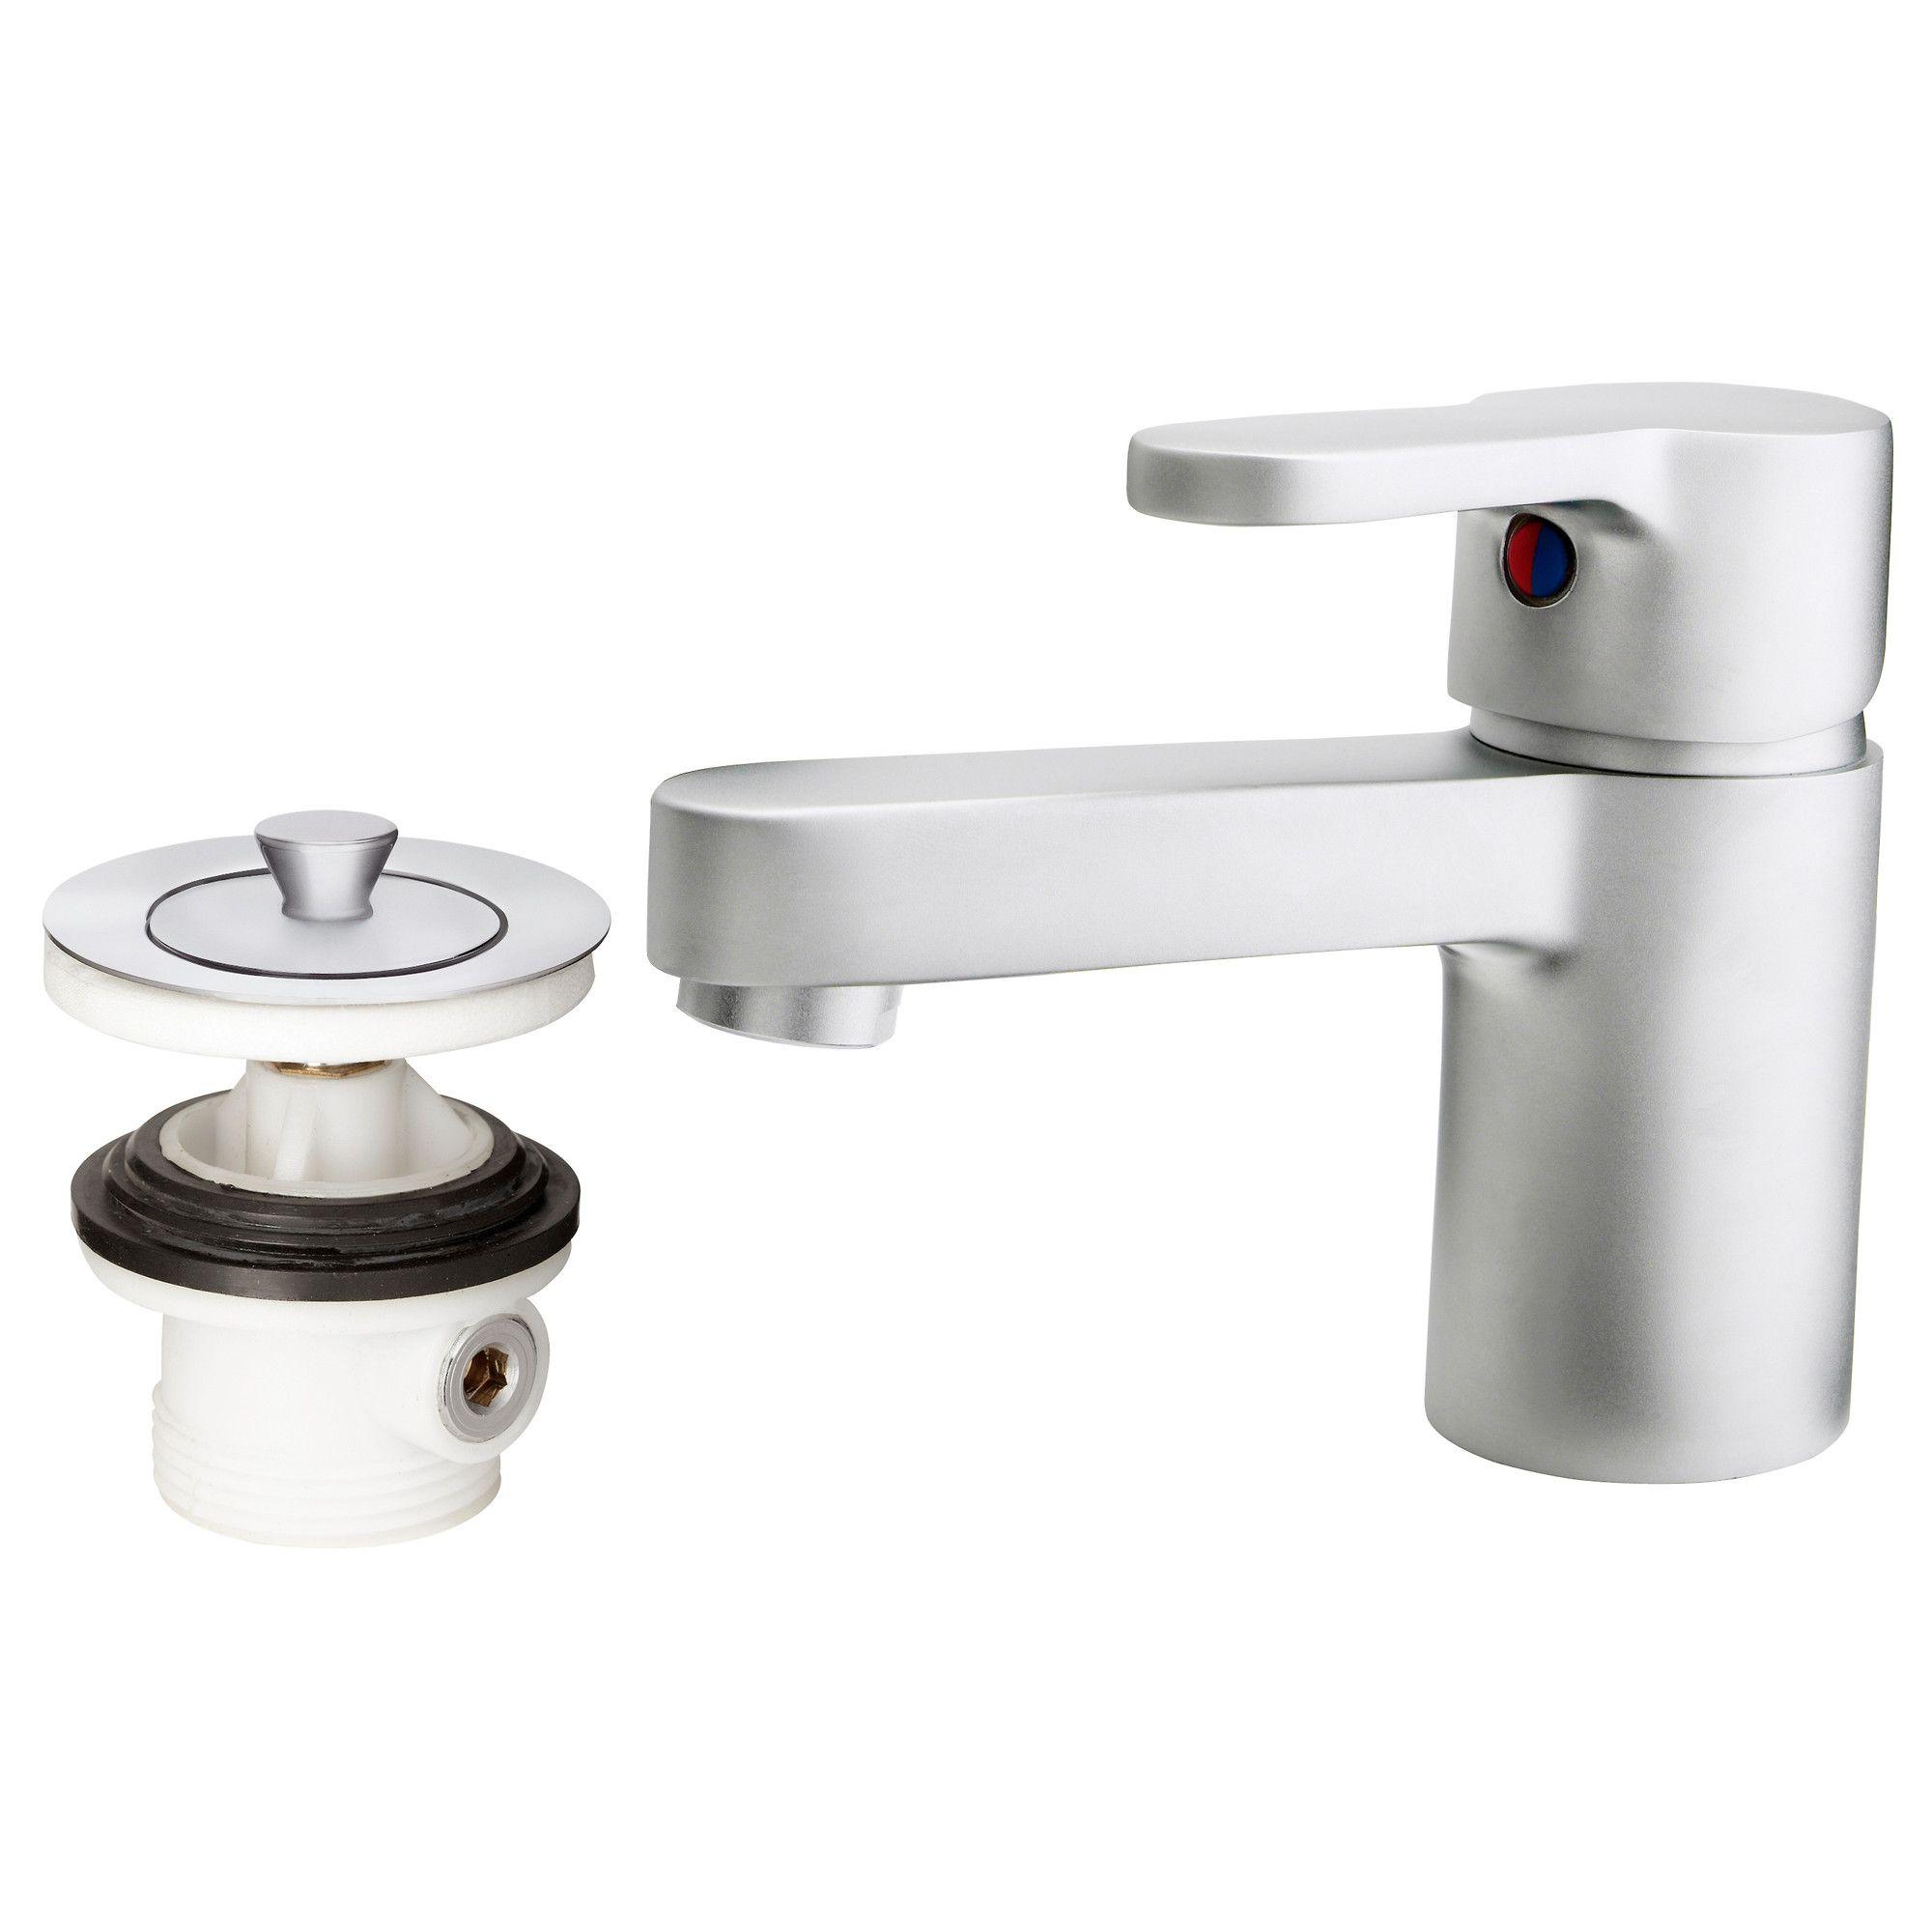 ENSEN Bath faucet with strainer - IKEA 70.00   Renovation House ...